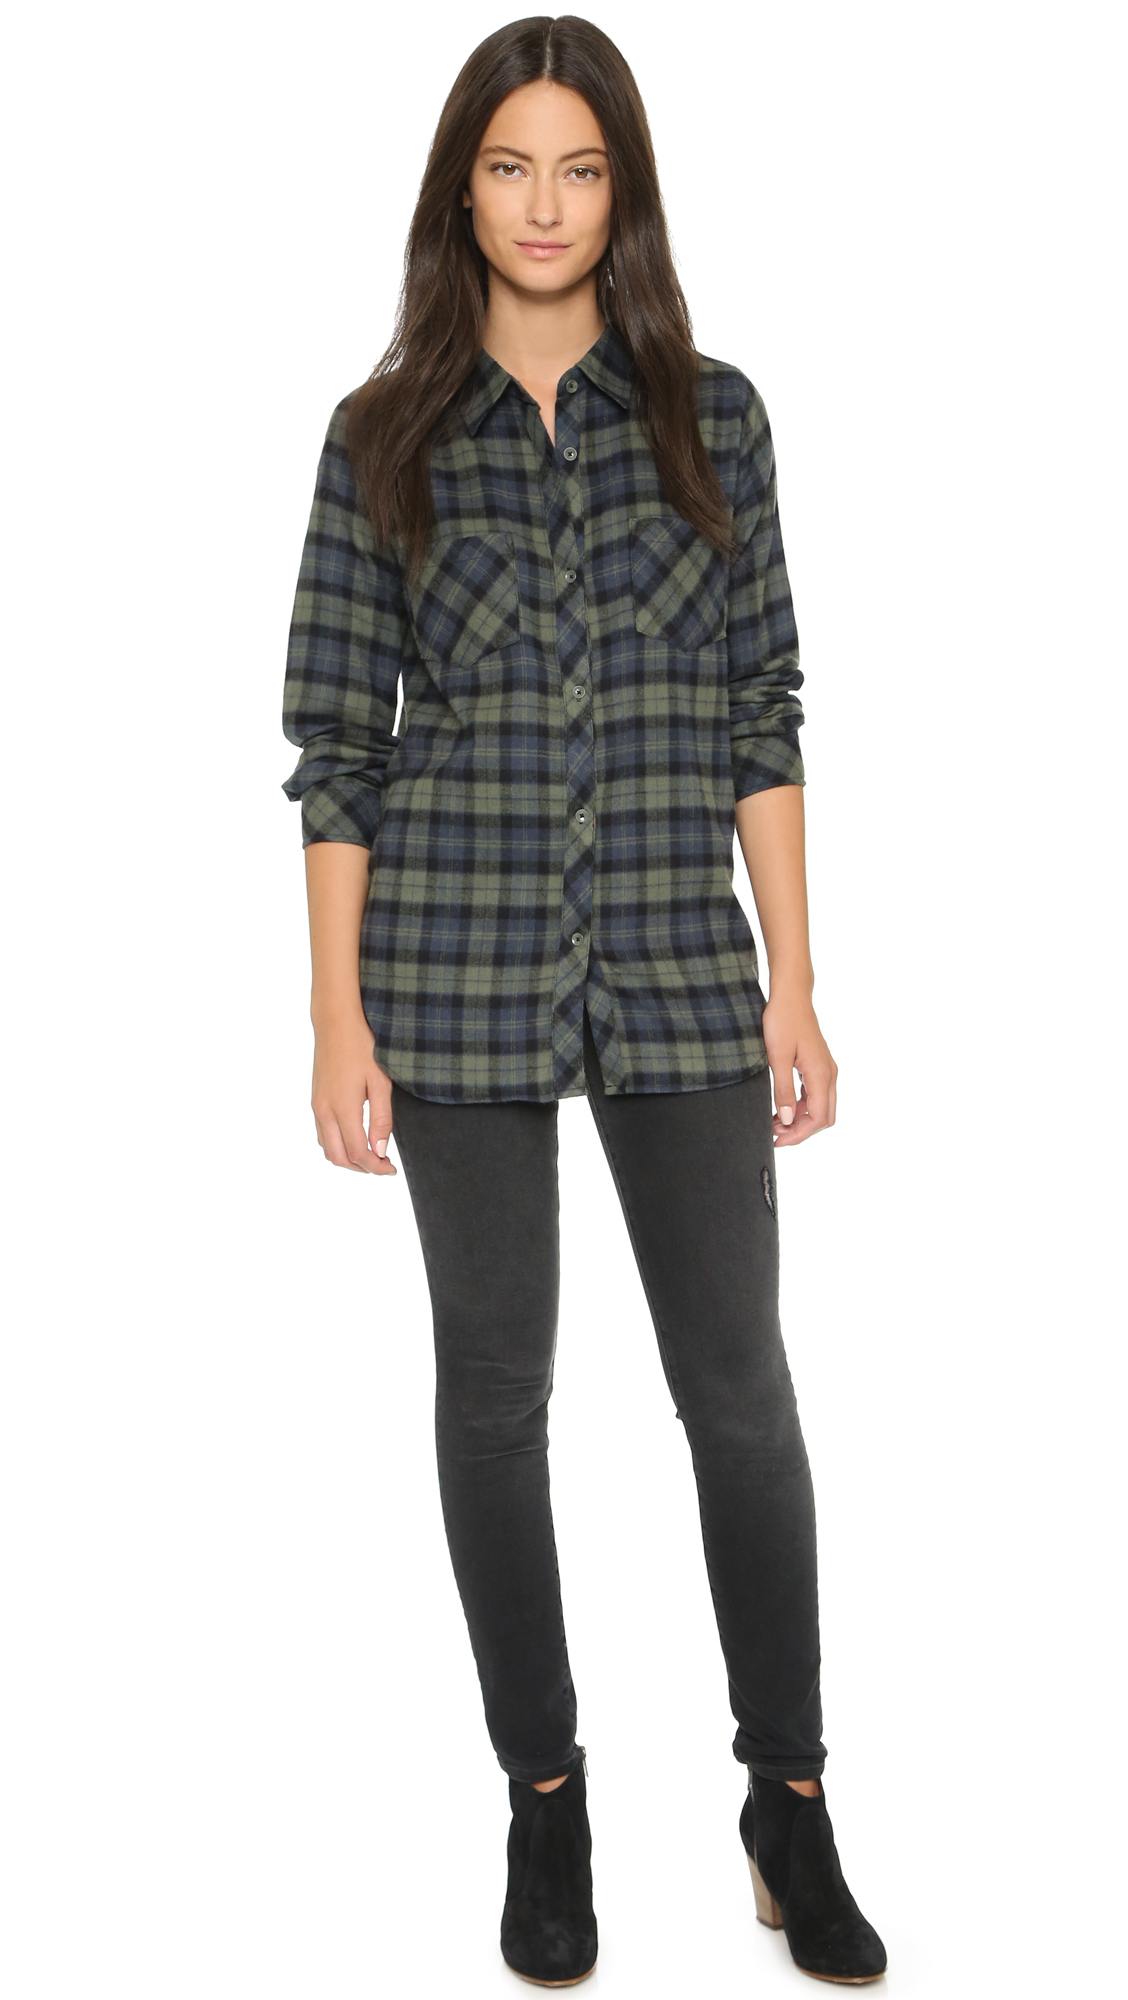 Women Flannel Shirts